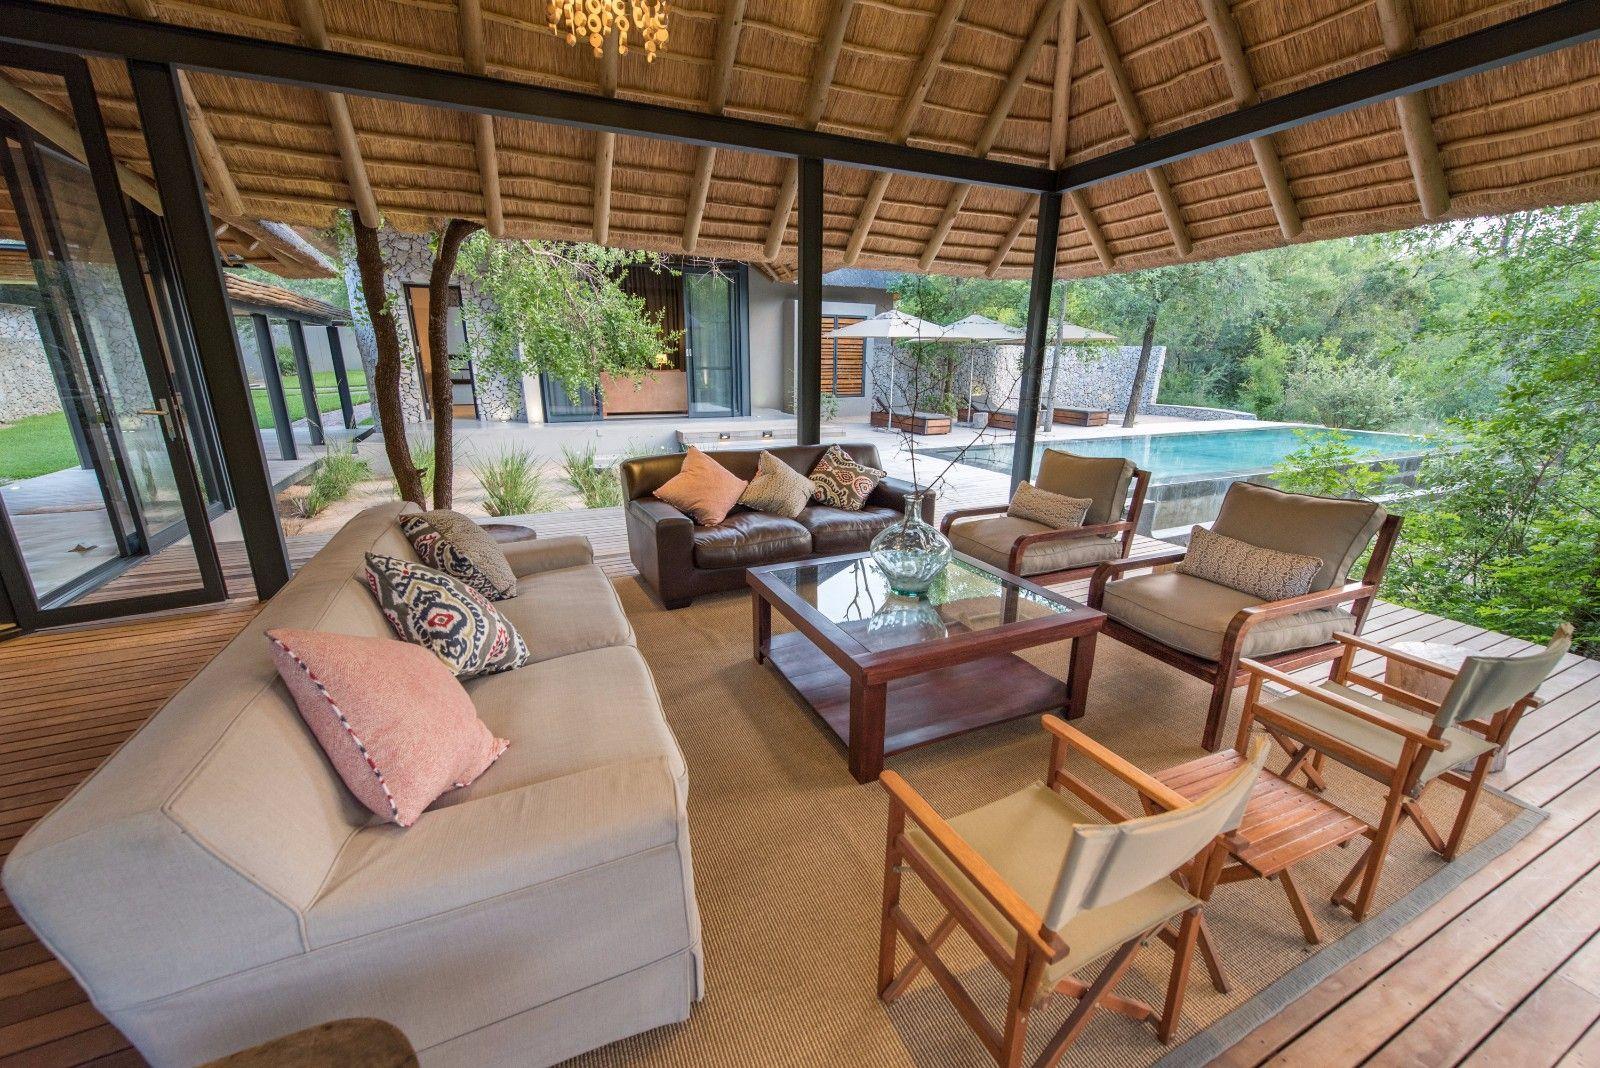 Hoedspruit, Hoedspruit Property  | Houses For Sale Hoedspruit, HOEDSPRUIT, Lodge 5 bedrooms property for sale Price:16,000,000